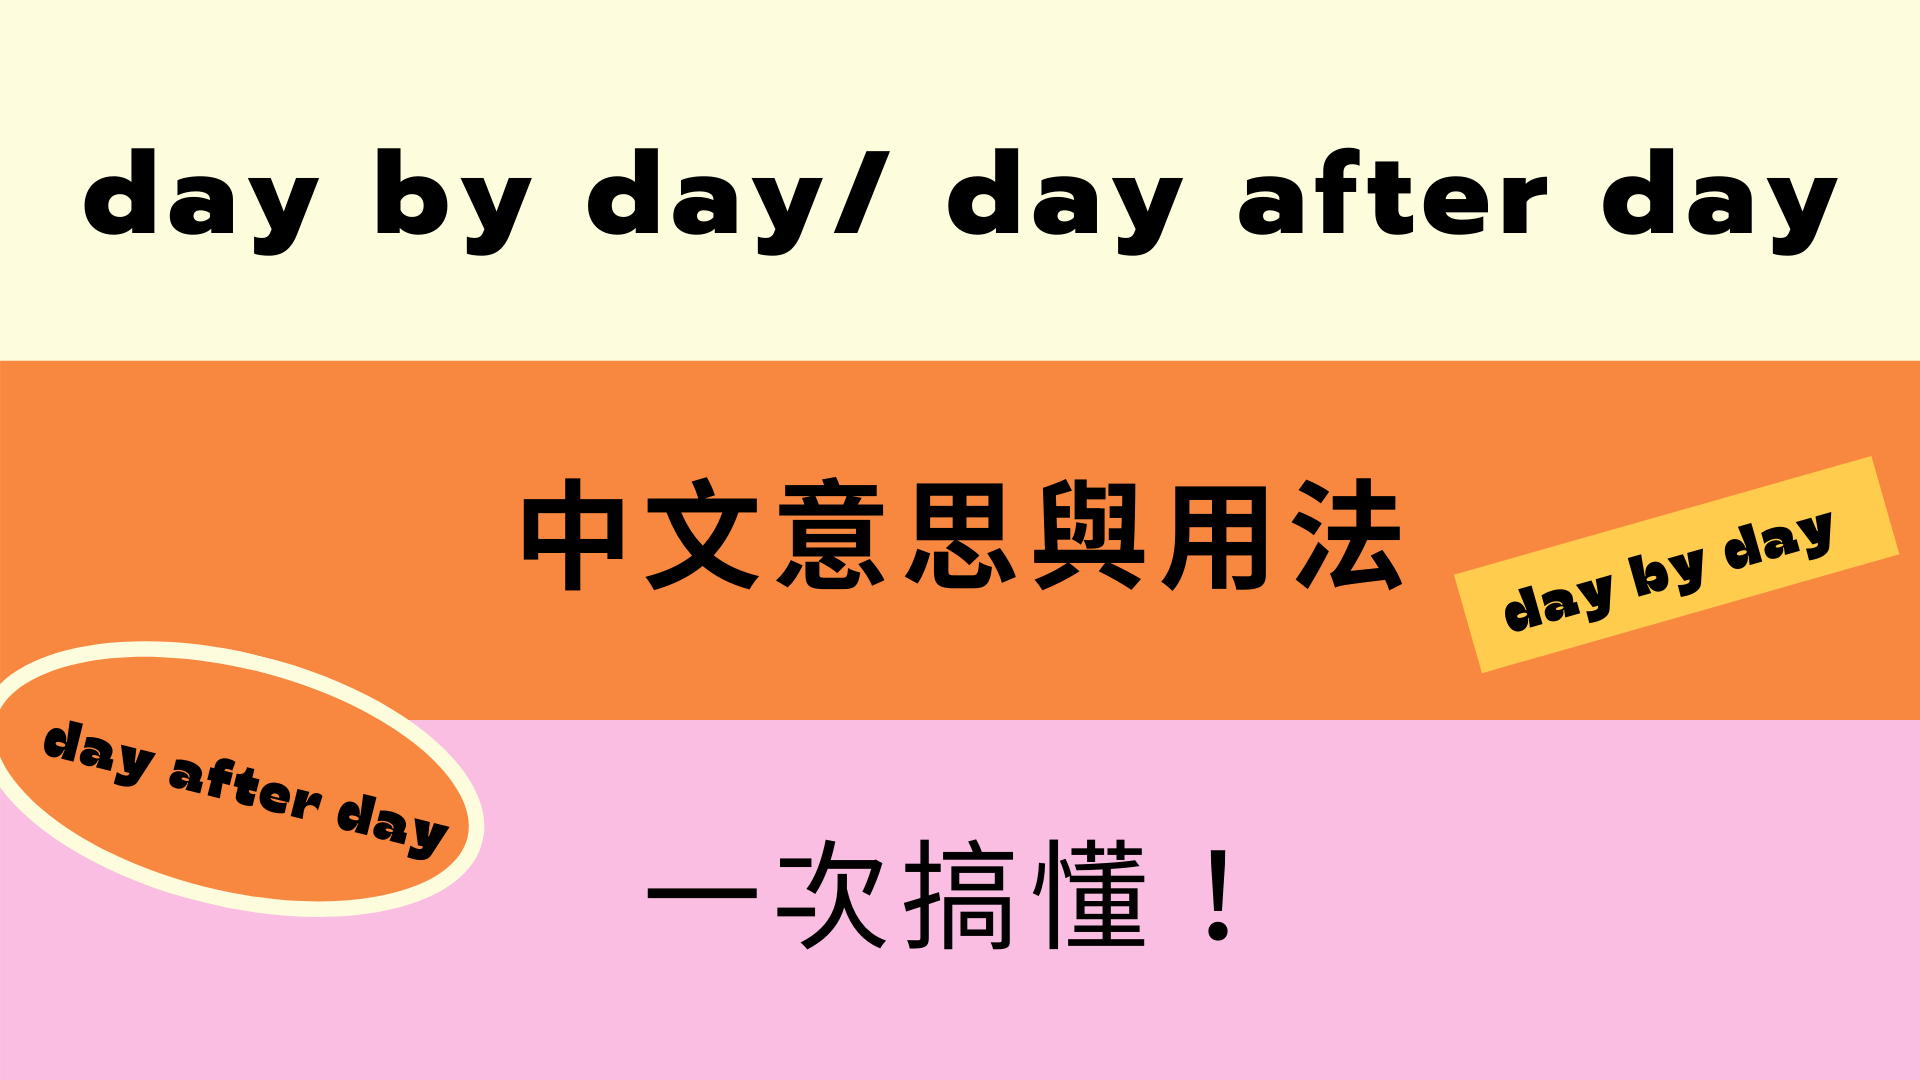 英文 day by day/ day after day 中文意思與用法差異!教學